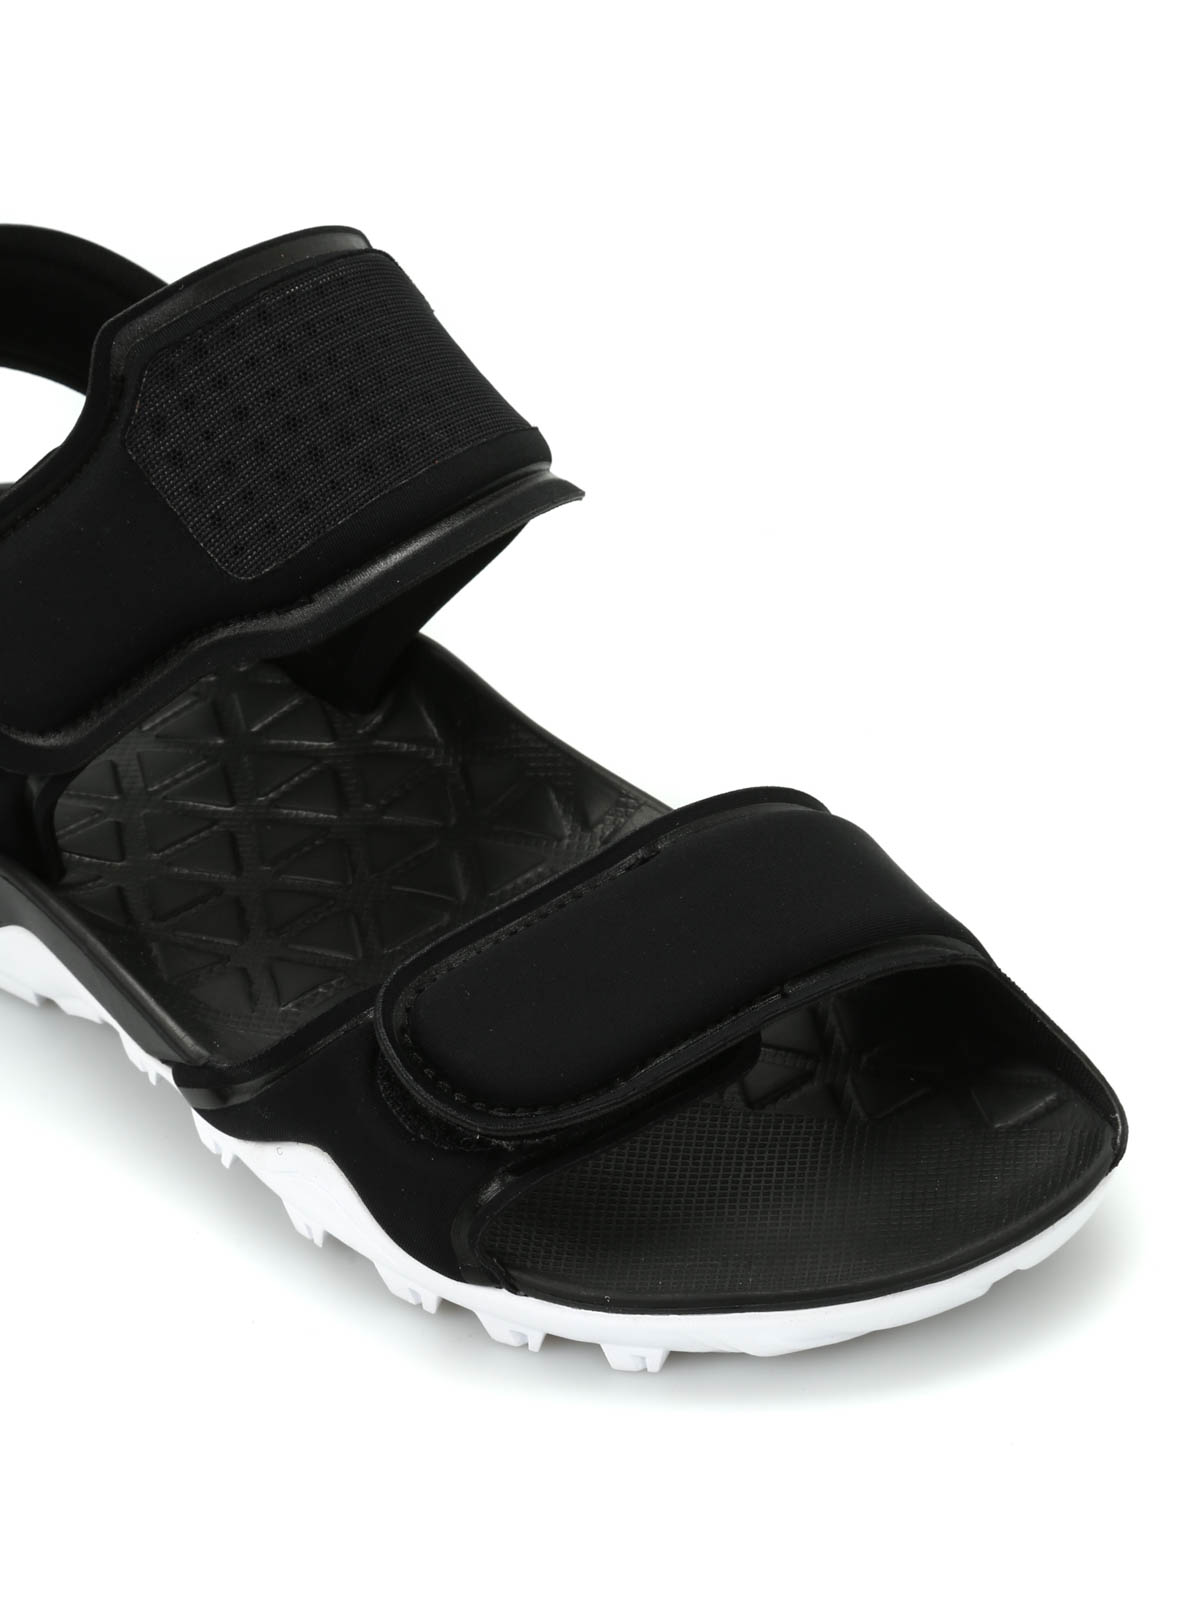 a0286bbef Adidas by Stella McCartney - Hikara sport sandals - sandals - S78410 ...